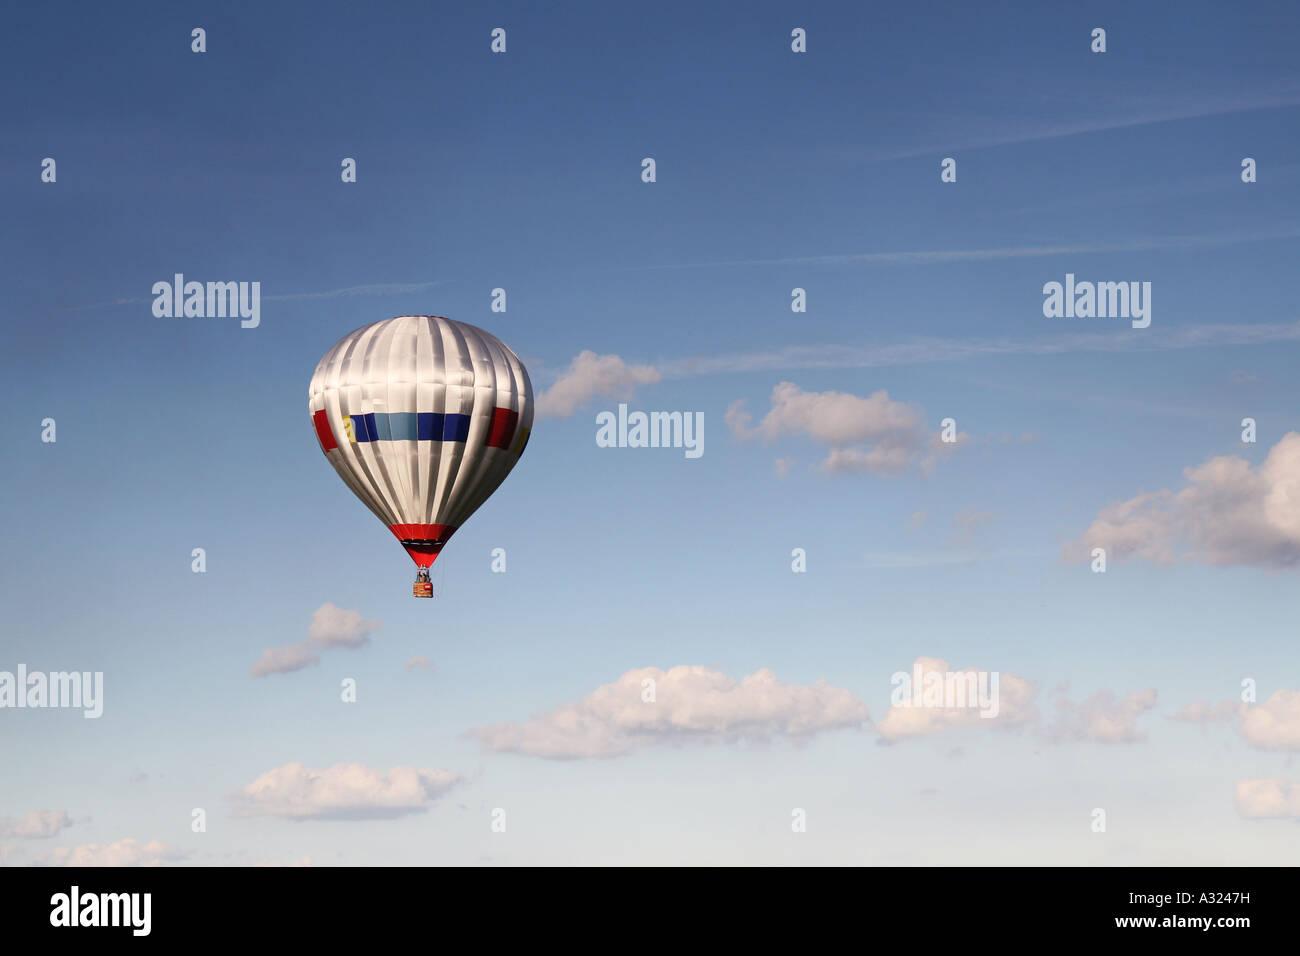 Plata en globo de aire caliente Imagen De Stock